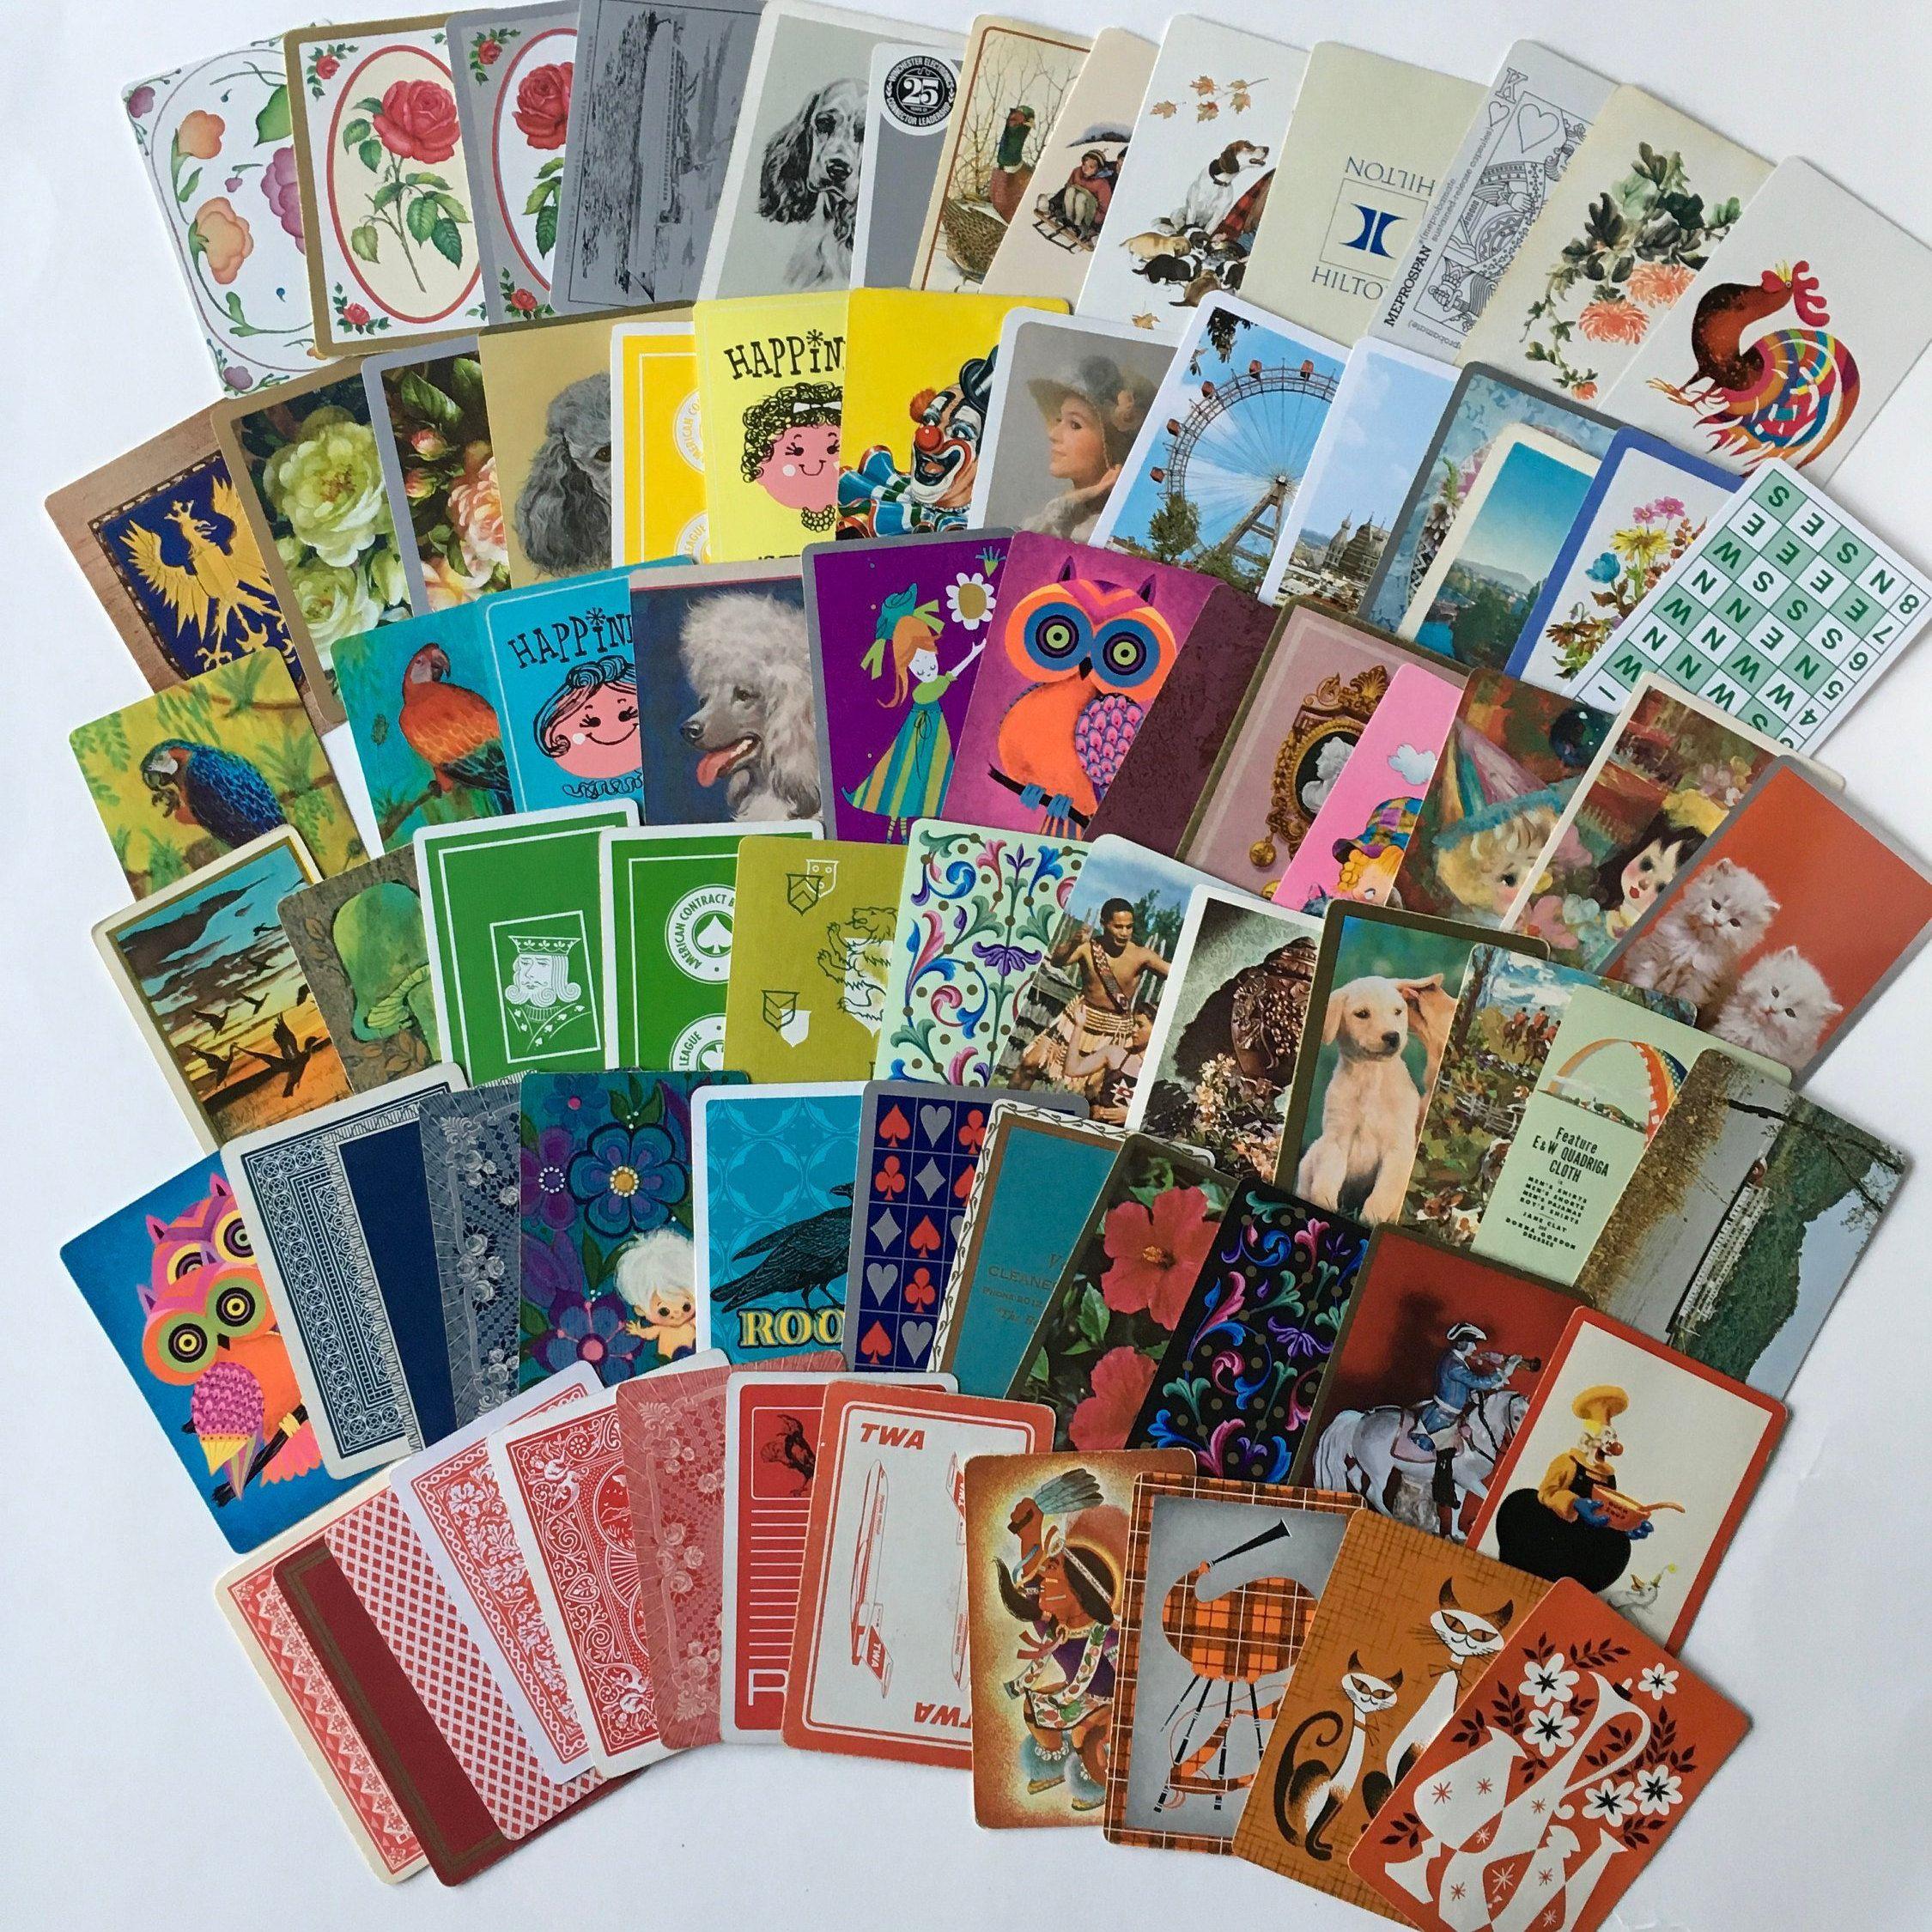 Lot of Vintage Ephemera Collage Art Junk Journals Paper Crafting Fun Assortment